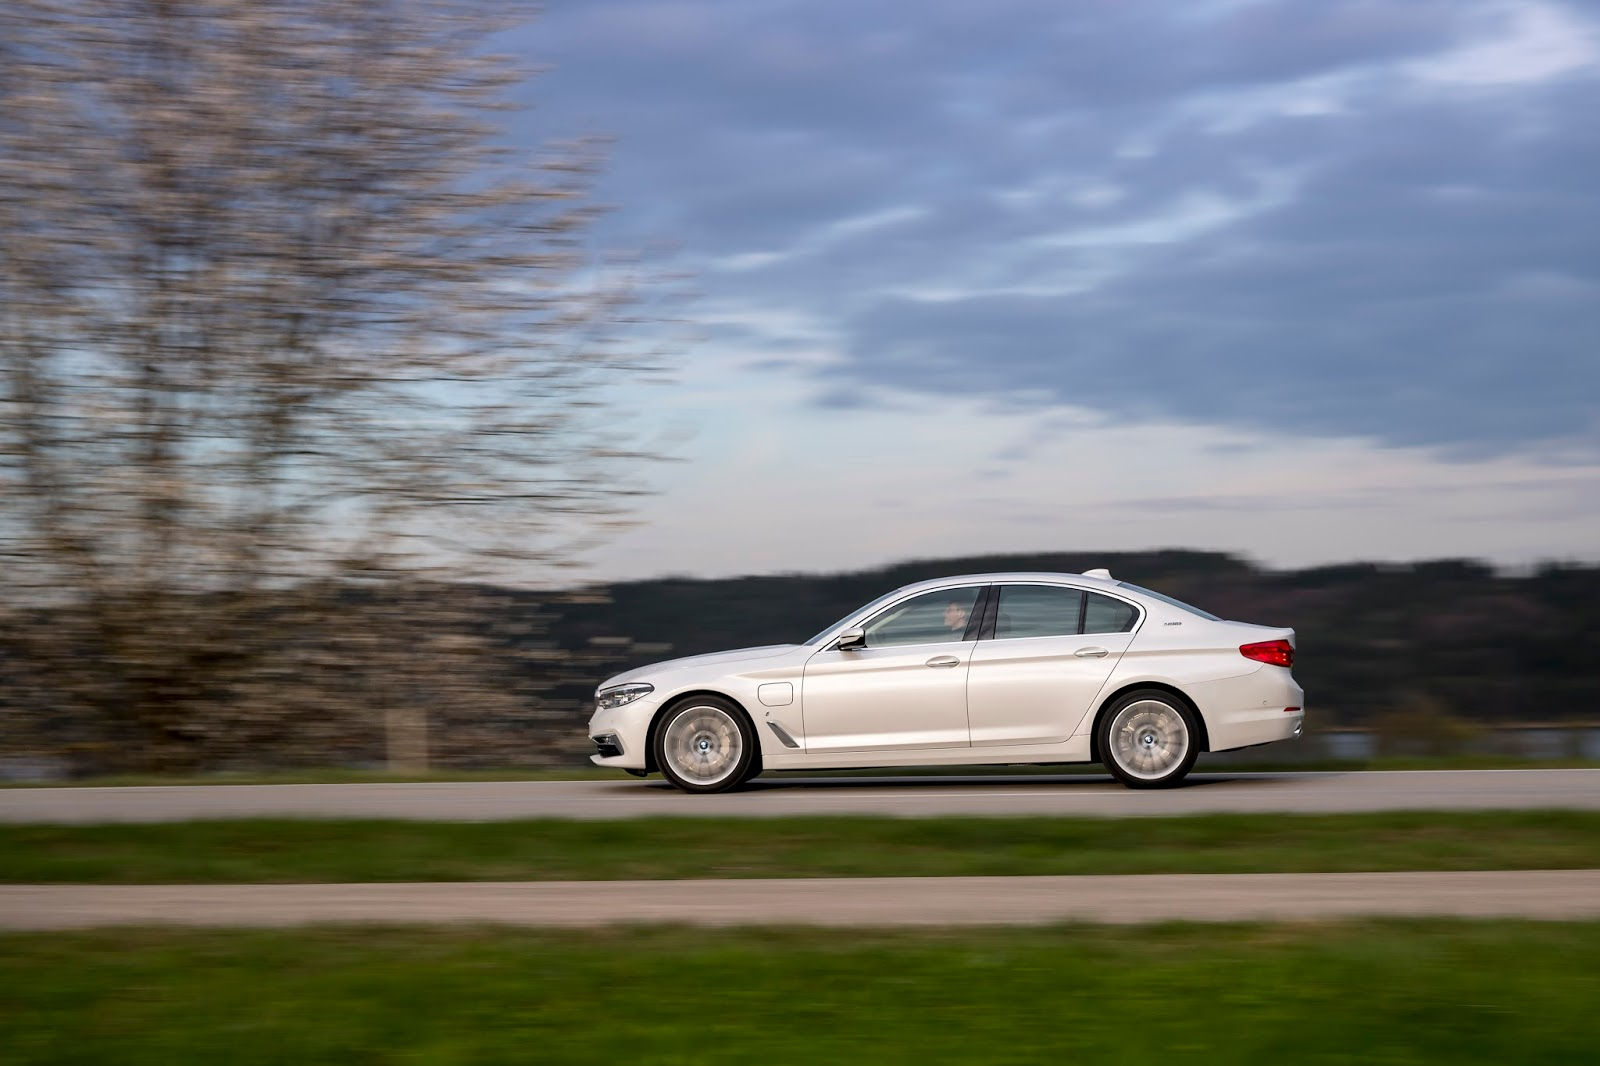 P90256362 highRes the new bmw 530e ipe Η BMW 530e iPerformance φέρνει την ηλεκτρική επανάσταση BMW, BMW 5, BMW 530e iPerformance, Electric cars, Hybrid, Λανσάρισμα